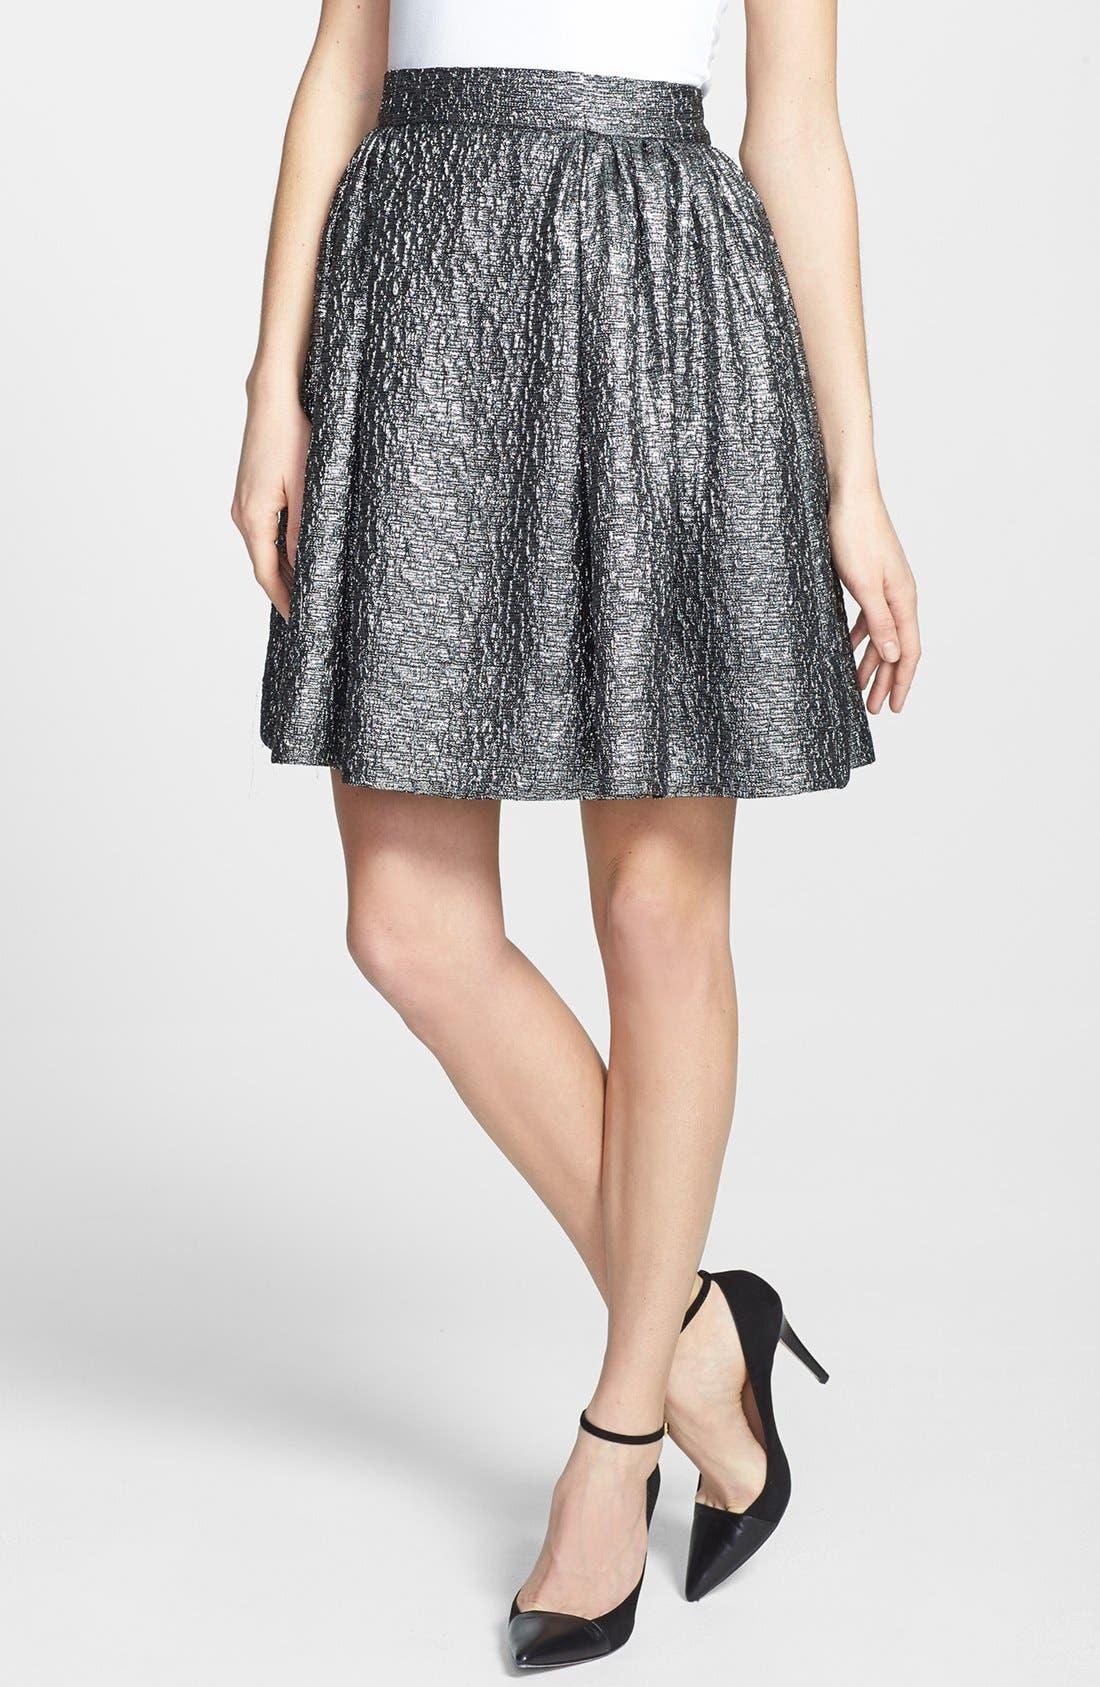 Alternate Image 1 Selected - kate spade new york 'aimee' metallic textured pleat skirt